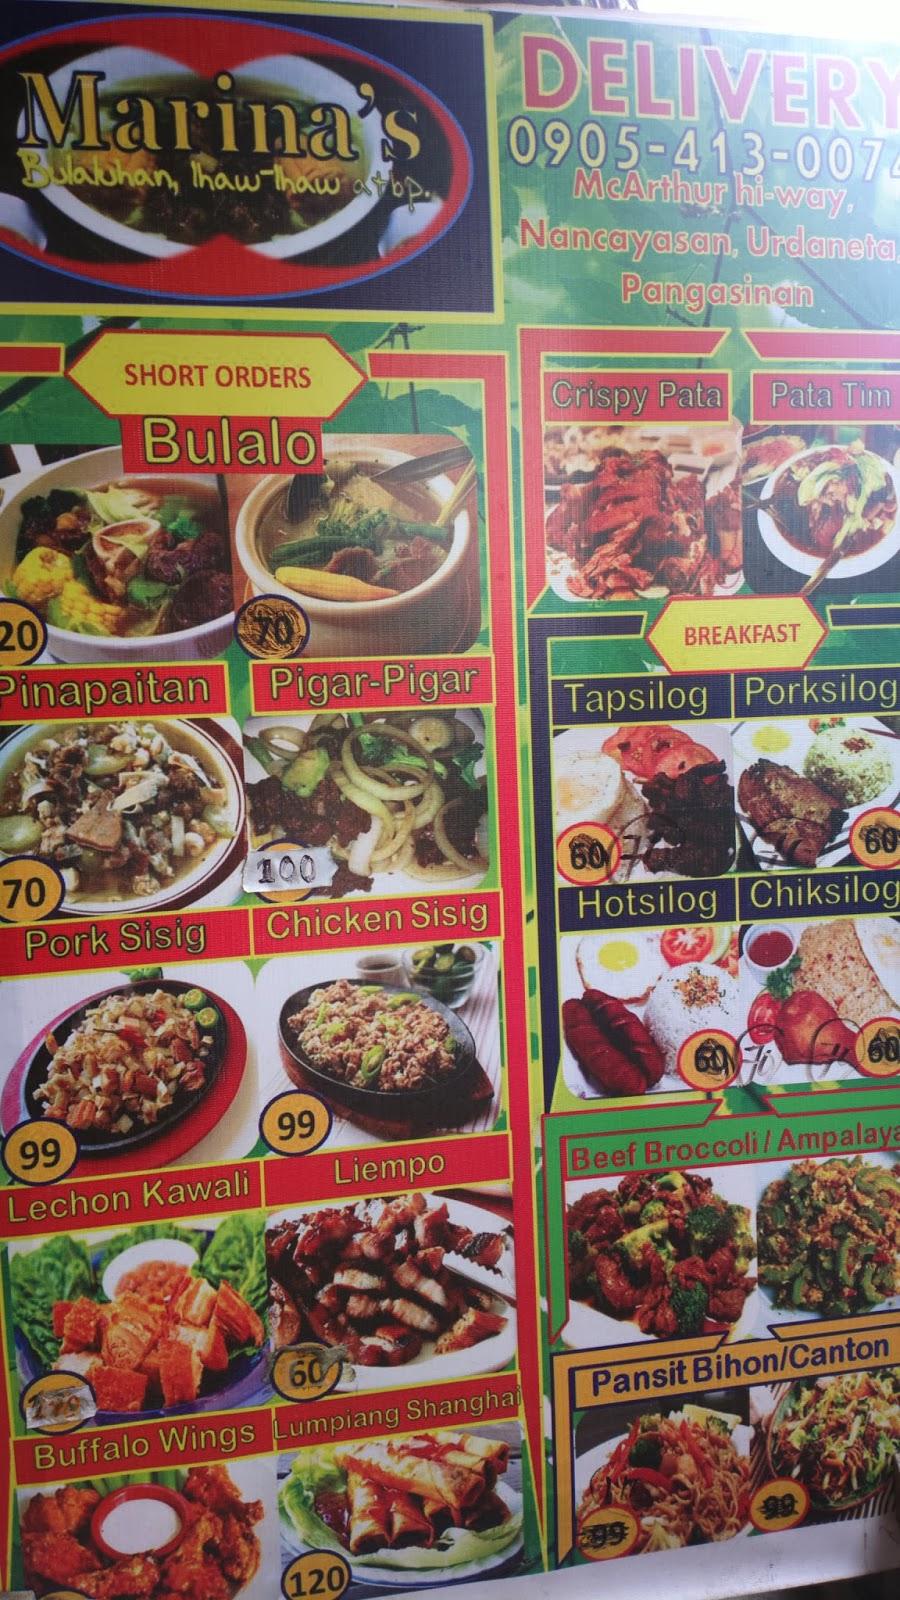 Marina's Bulalohan Ihaw-ihaw Atbp. in Urdaneta City